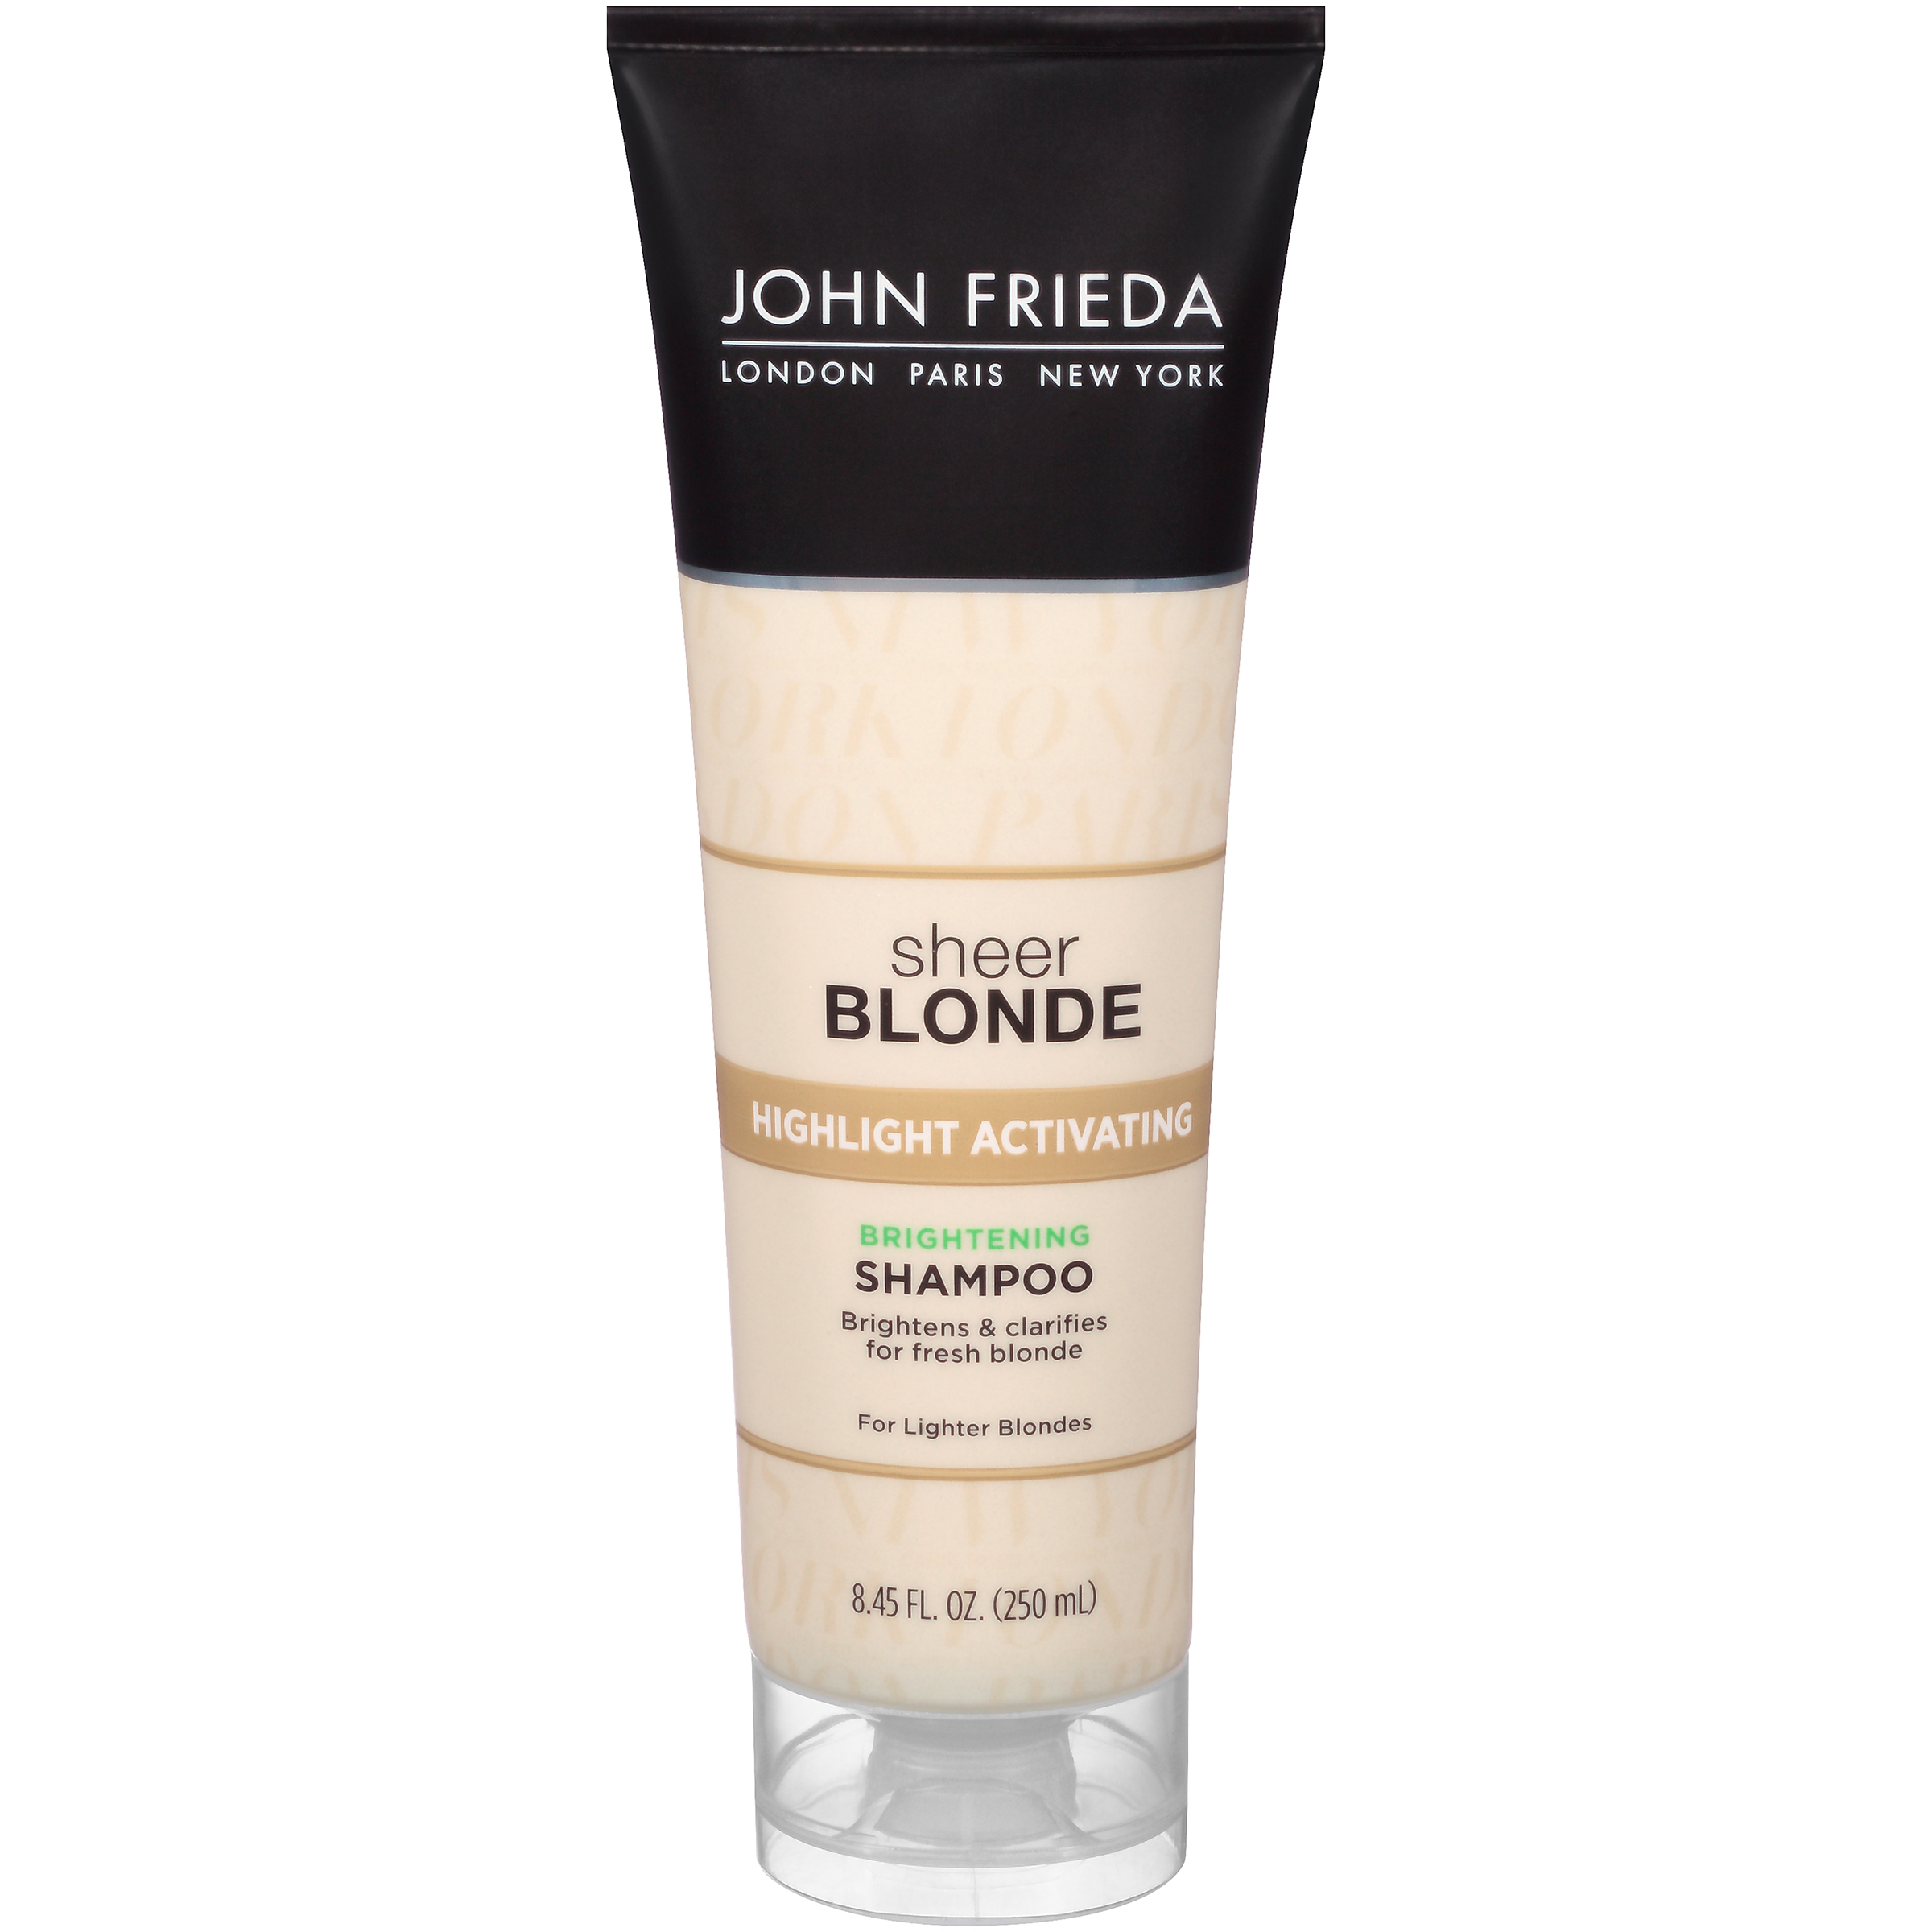 John Frieda Sheer Blonde Brightening Shampoo, 8.45 Oz